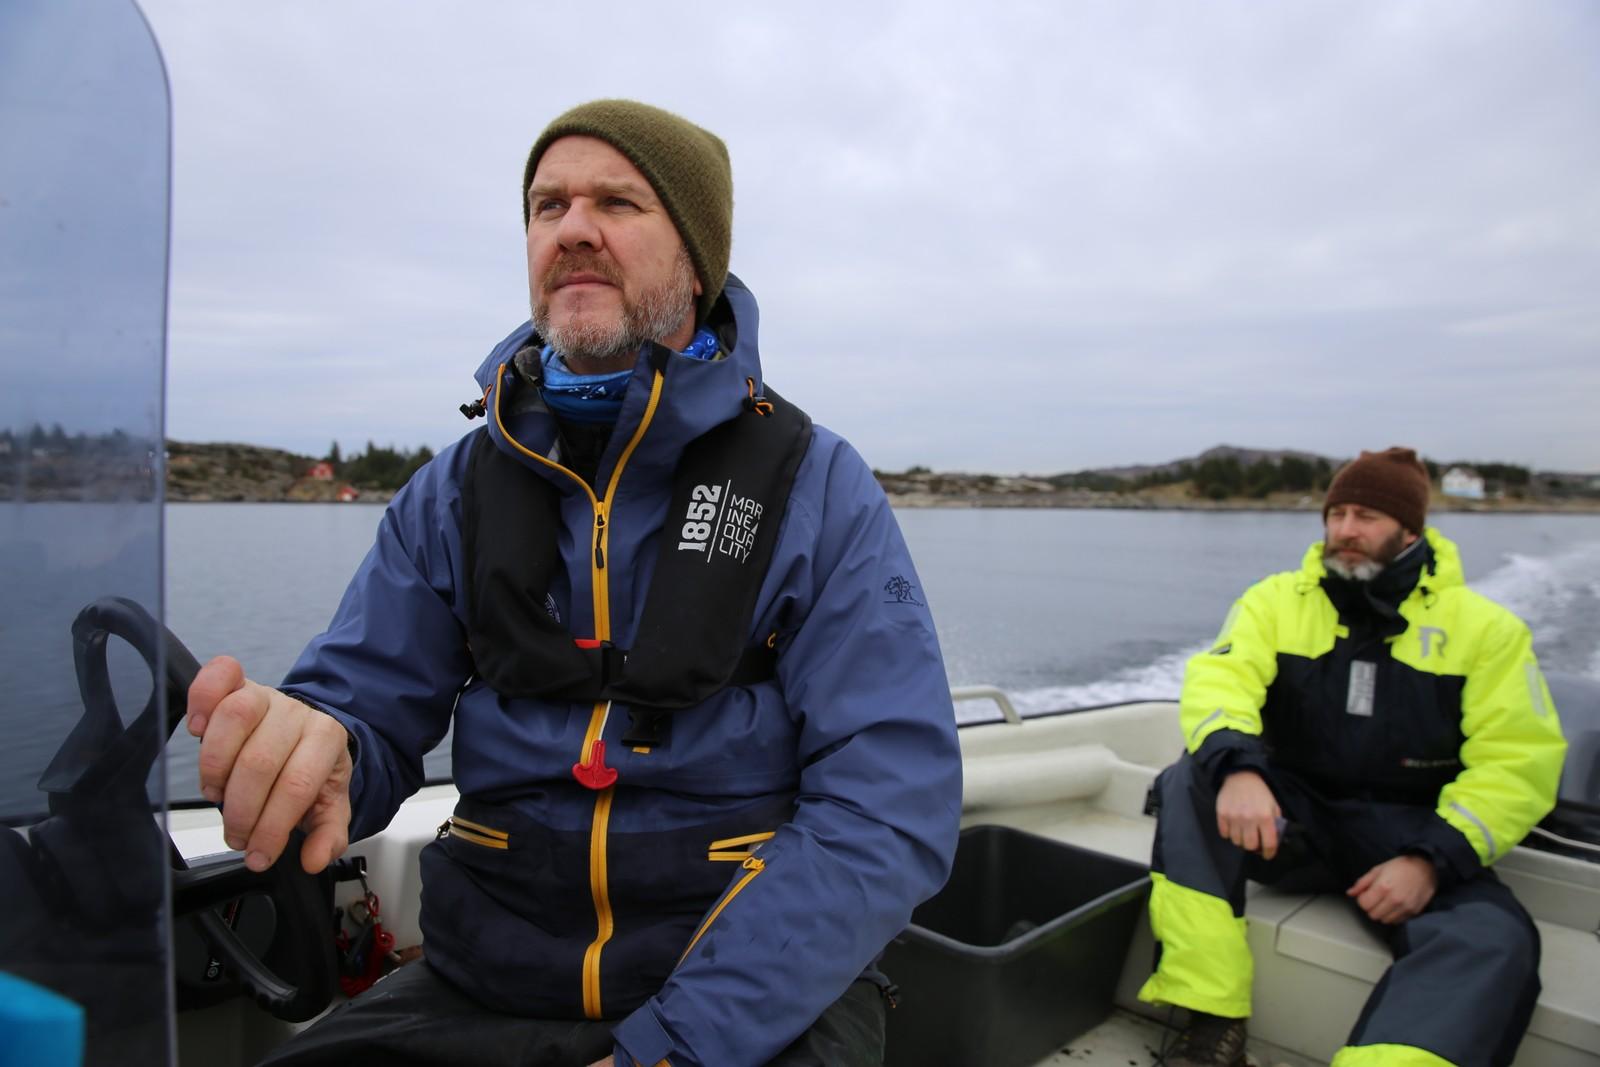 Kenneth Bruvik i Norges jeger- og fiskerforbund og kultursjef Lennart Fjell i Fjell kommune.